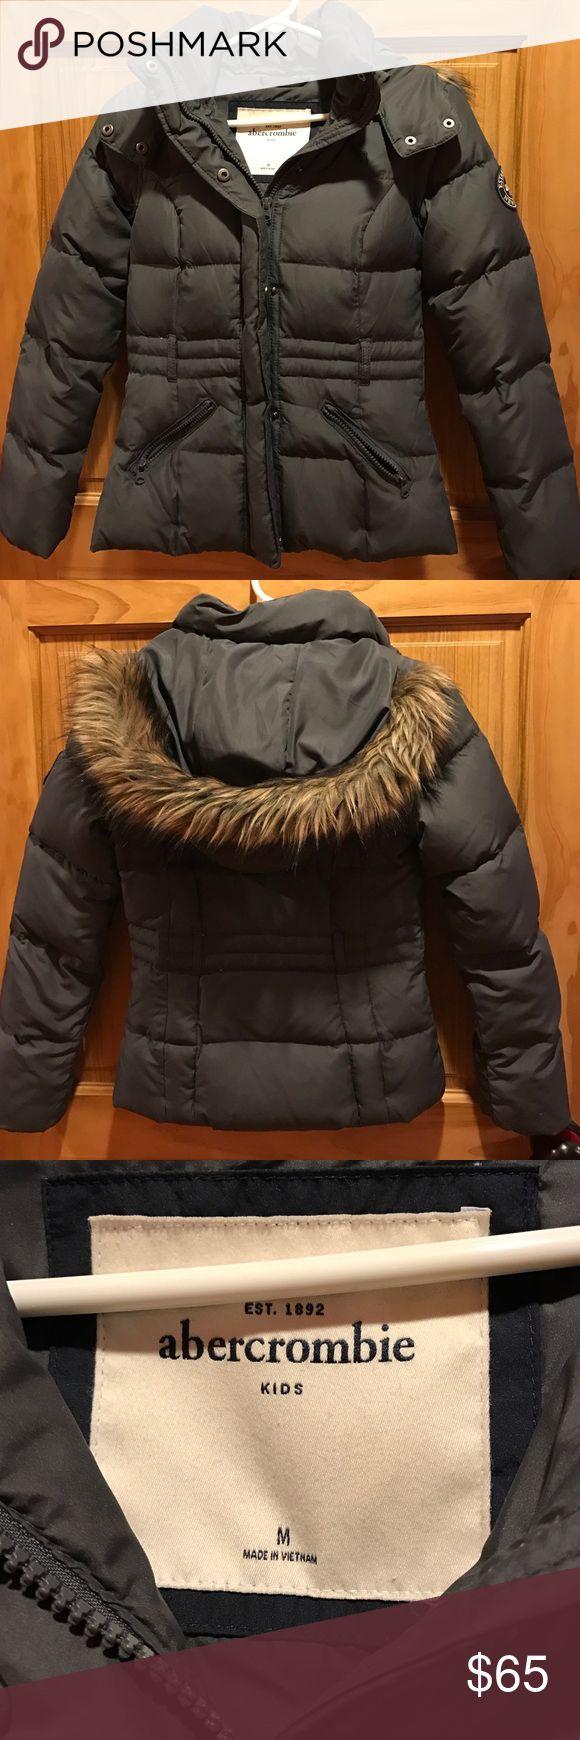 Abercrombie & Fitch kids winter jacket, like new! Abercrombie & Fitch kids winter jacket, like new!  Barely worn!! abercrombie kids Jackets & Coats